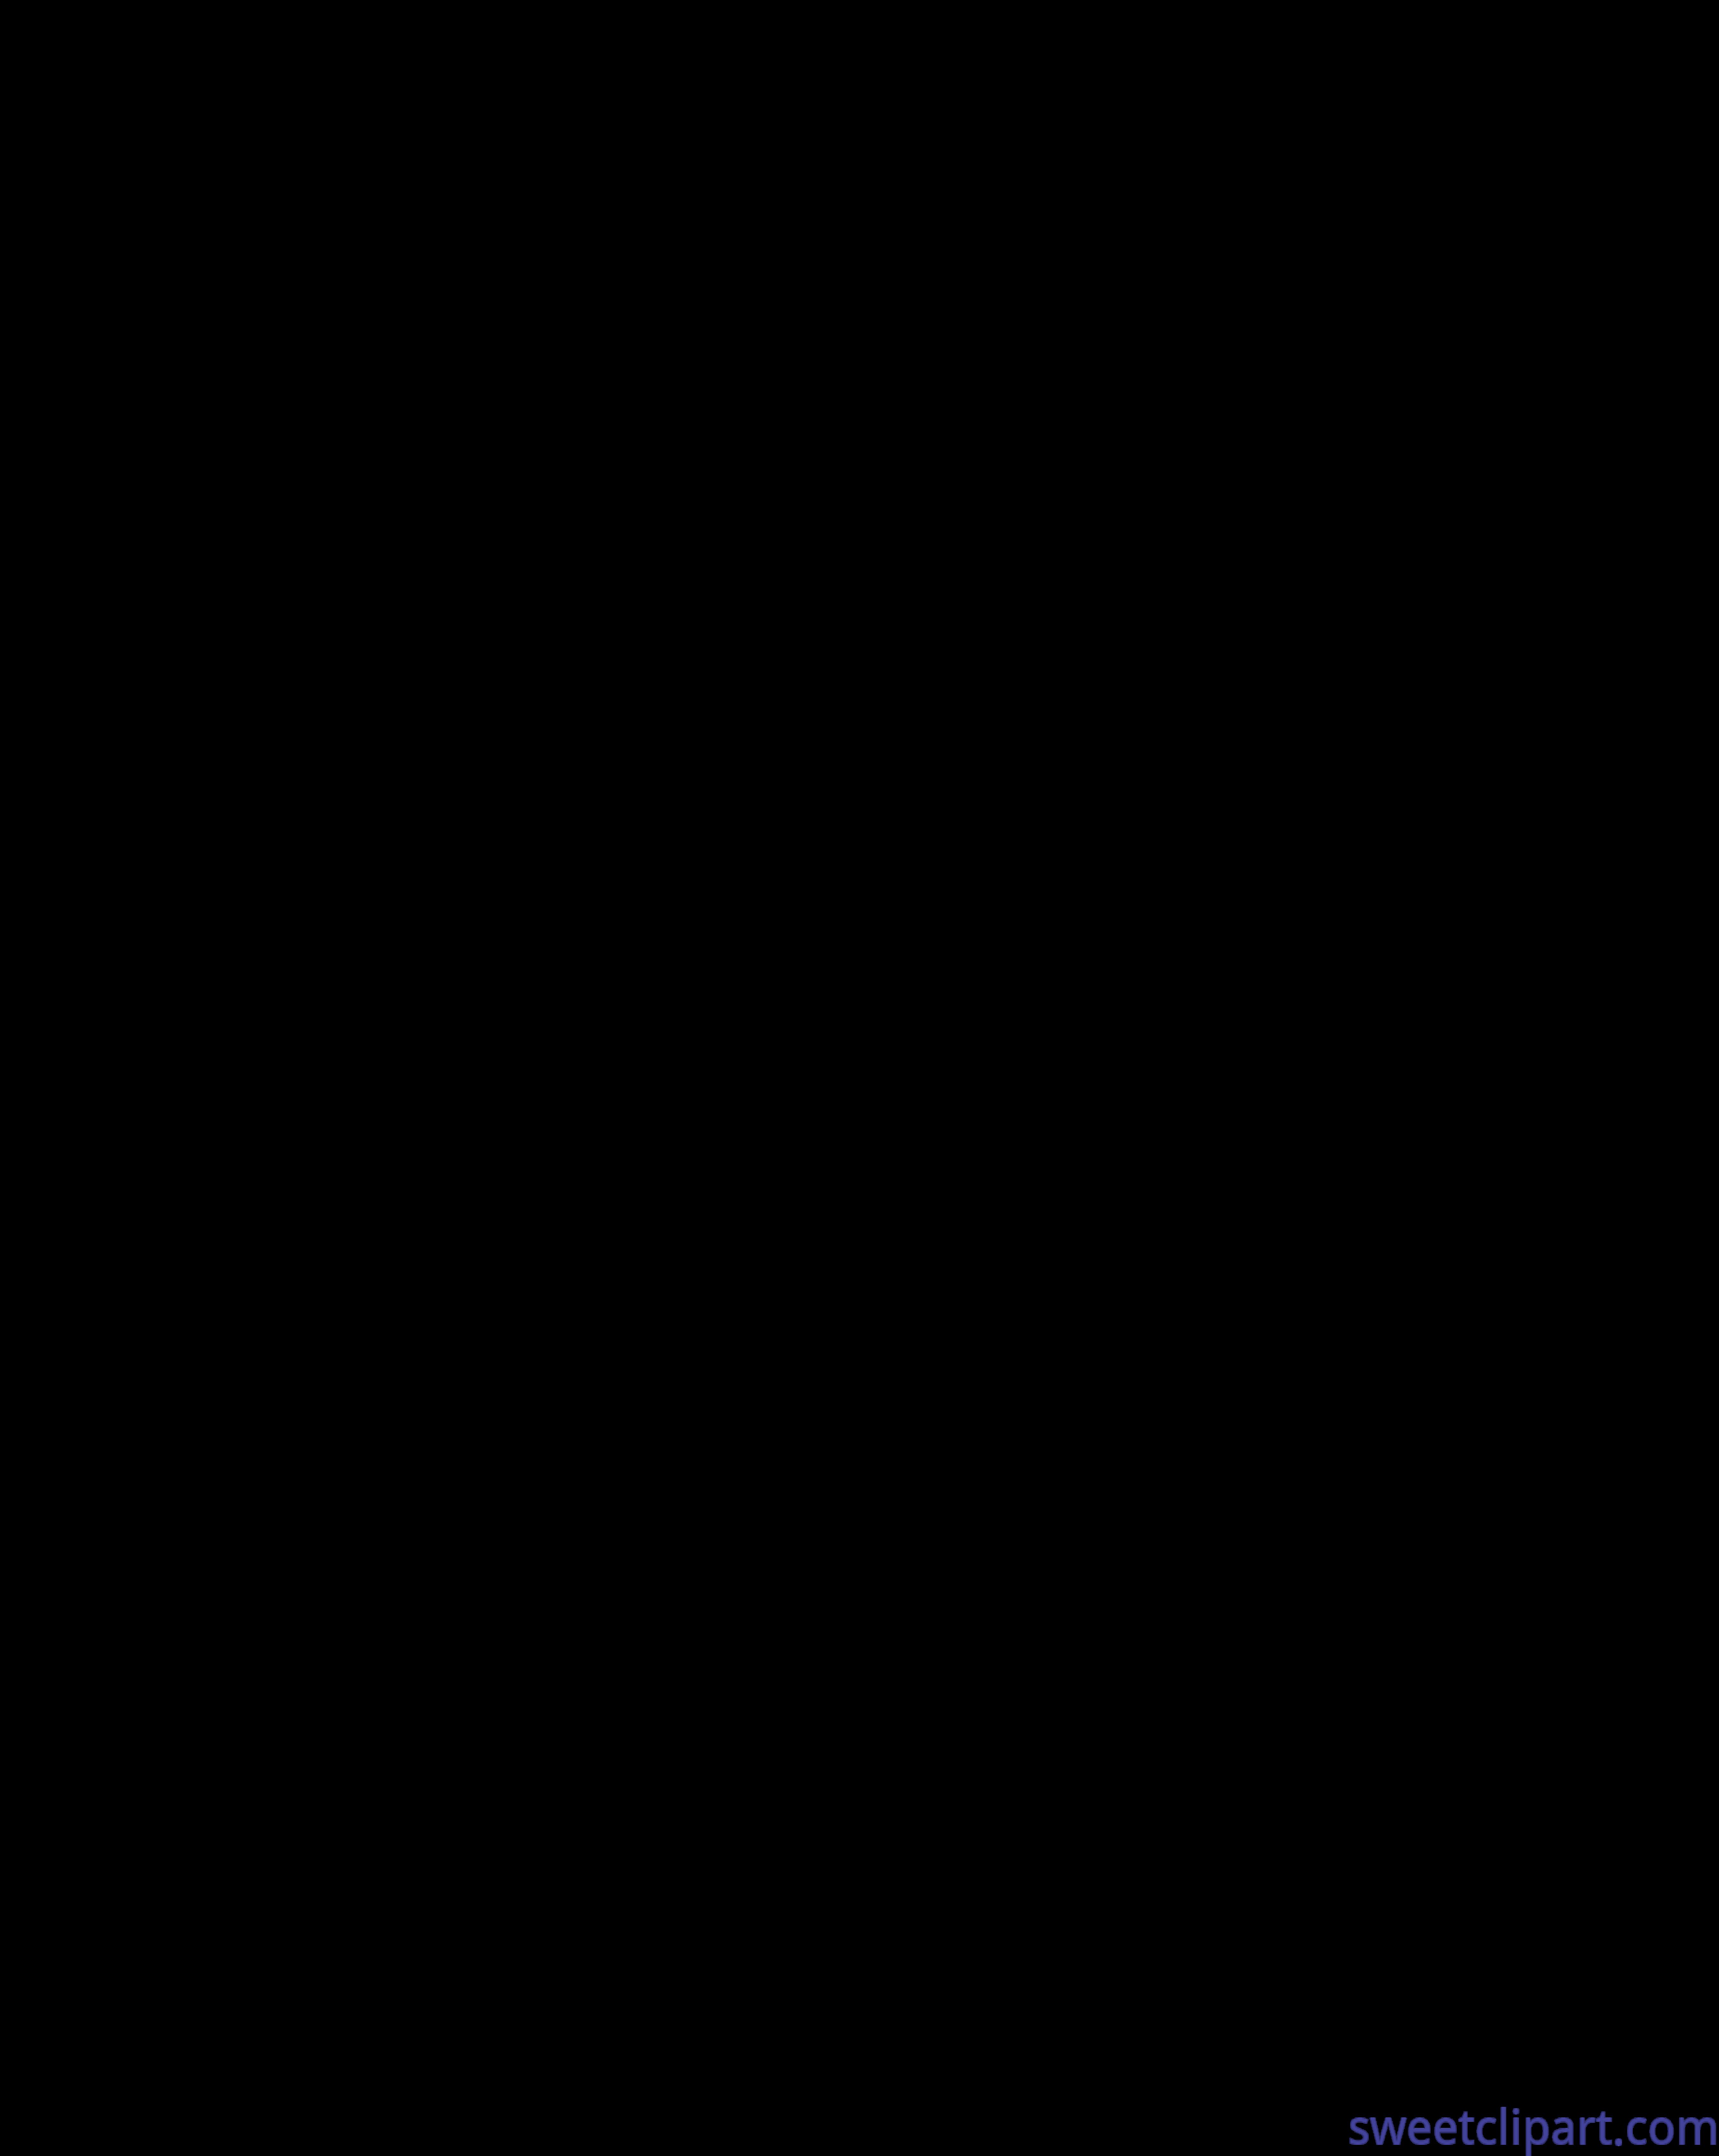 Dandelions black clip art. Dandelion clipart dandelion wish